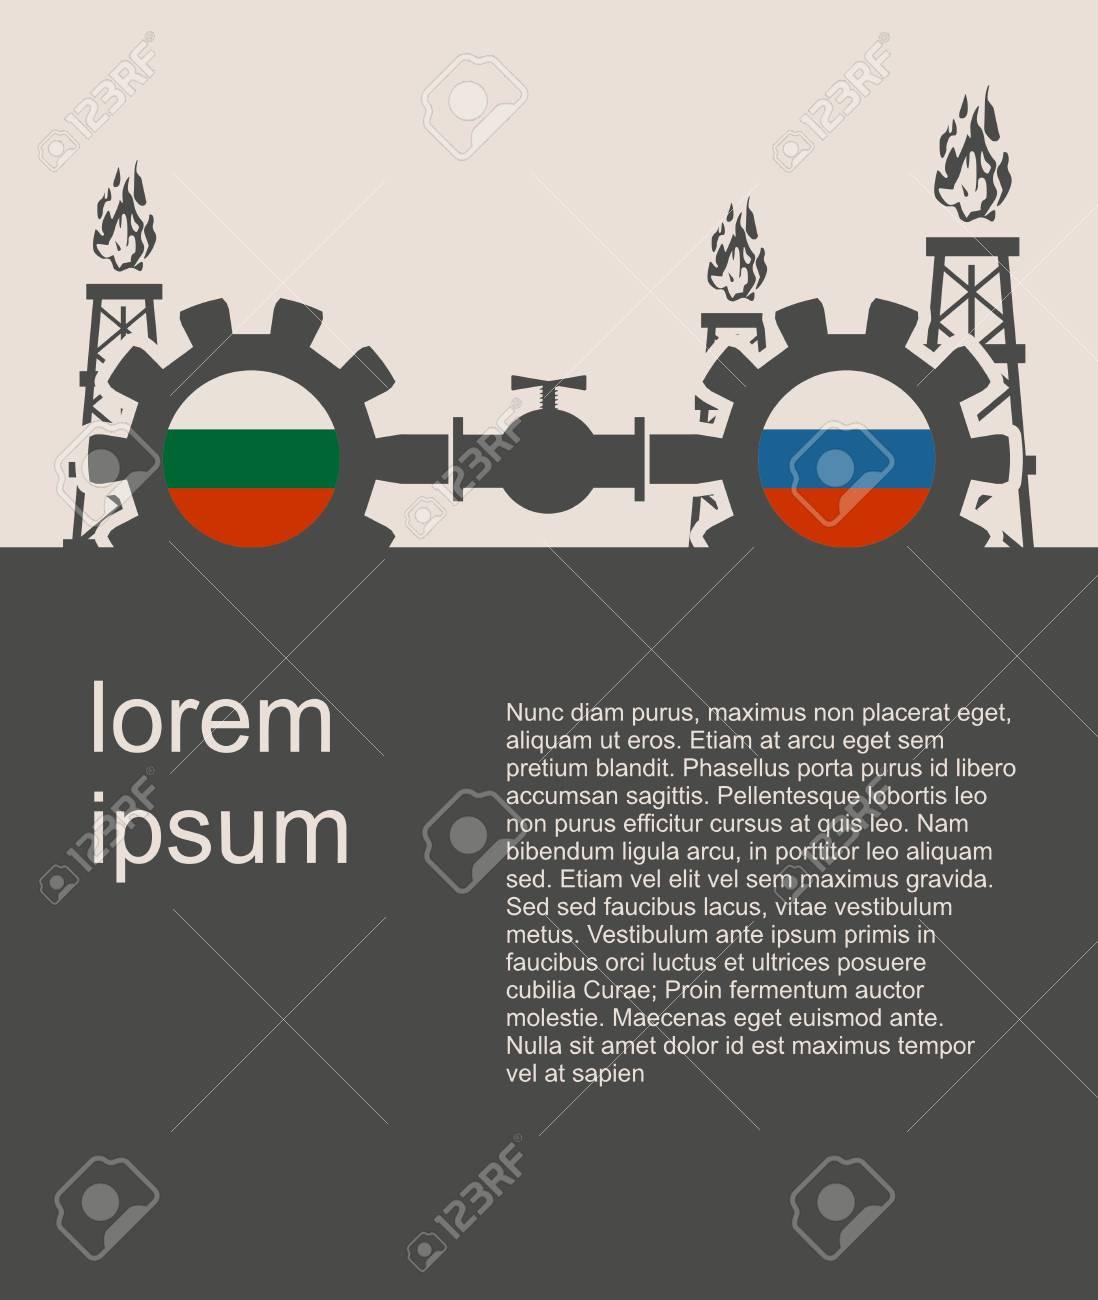 Imagen Relativa Al Tránsito De Gas Desde Rusia A Bulgaria ...